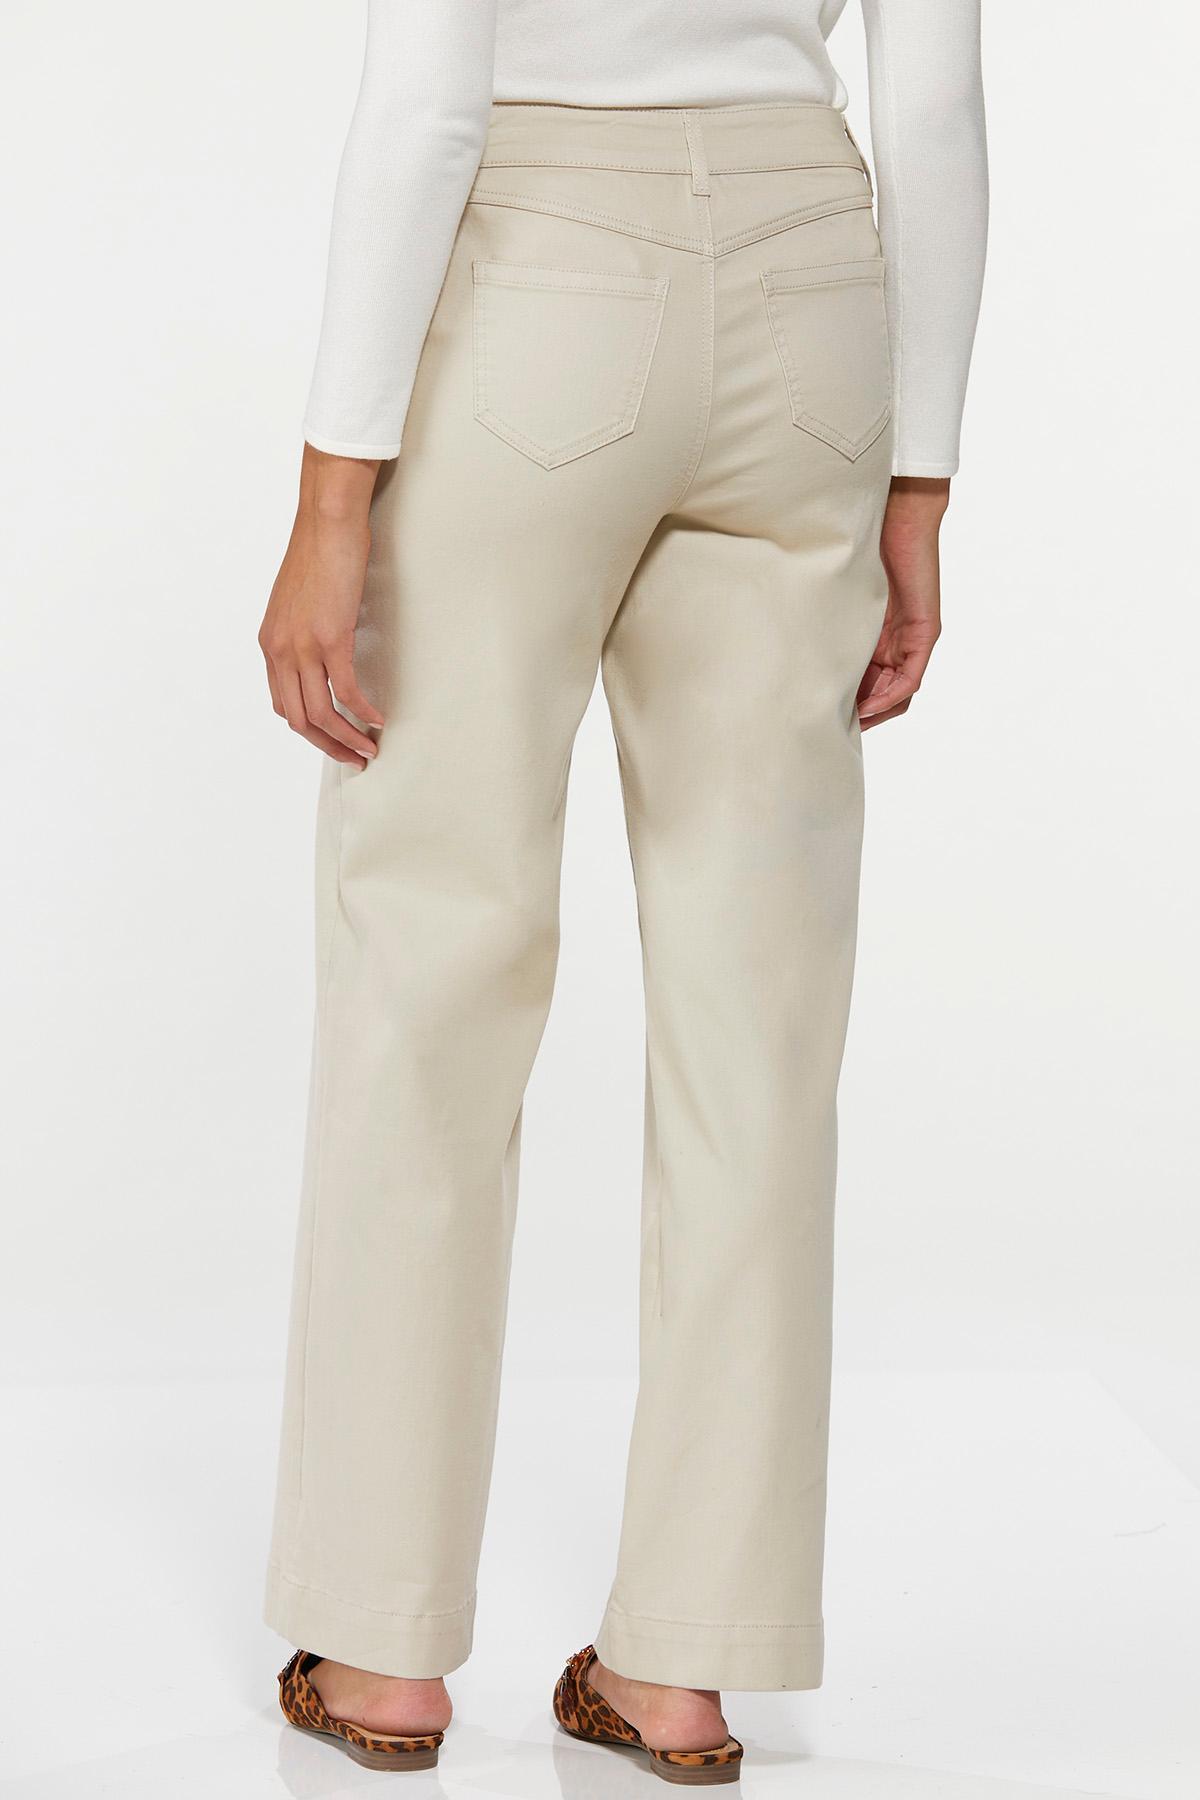 Twill Sailor Pants (Item #44666567)